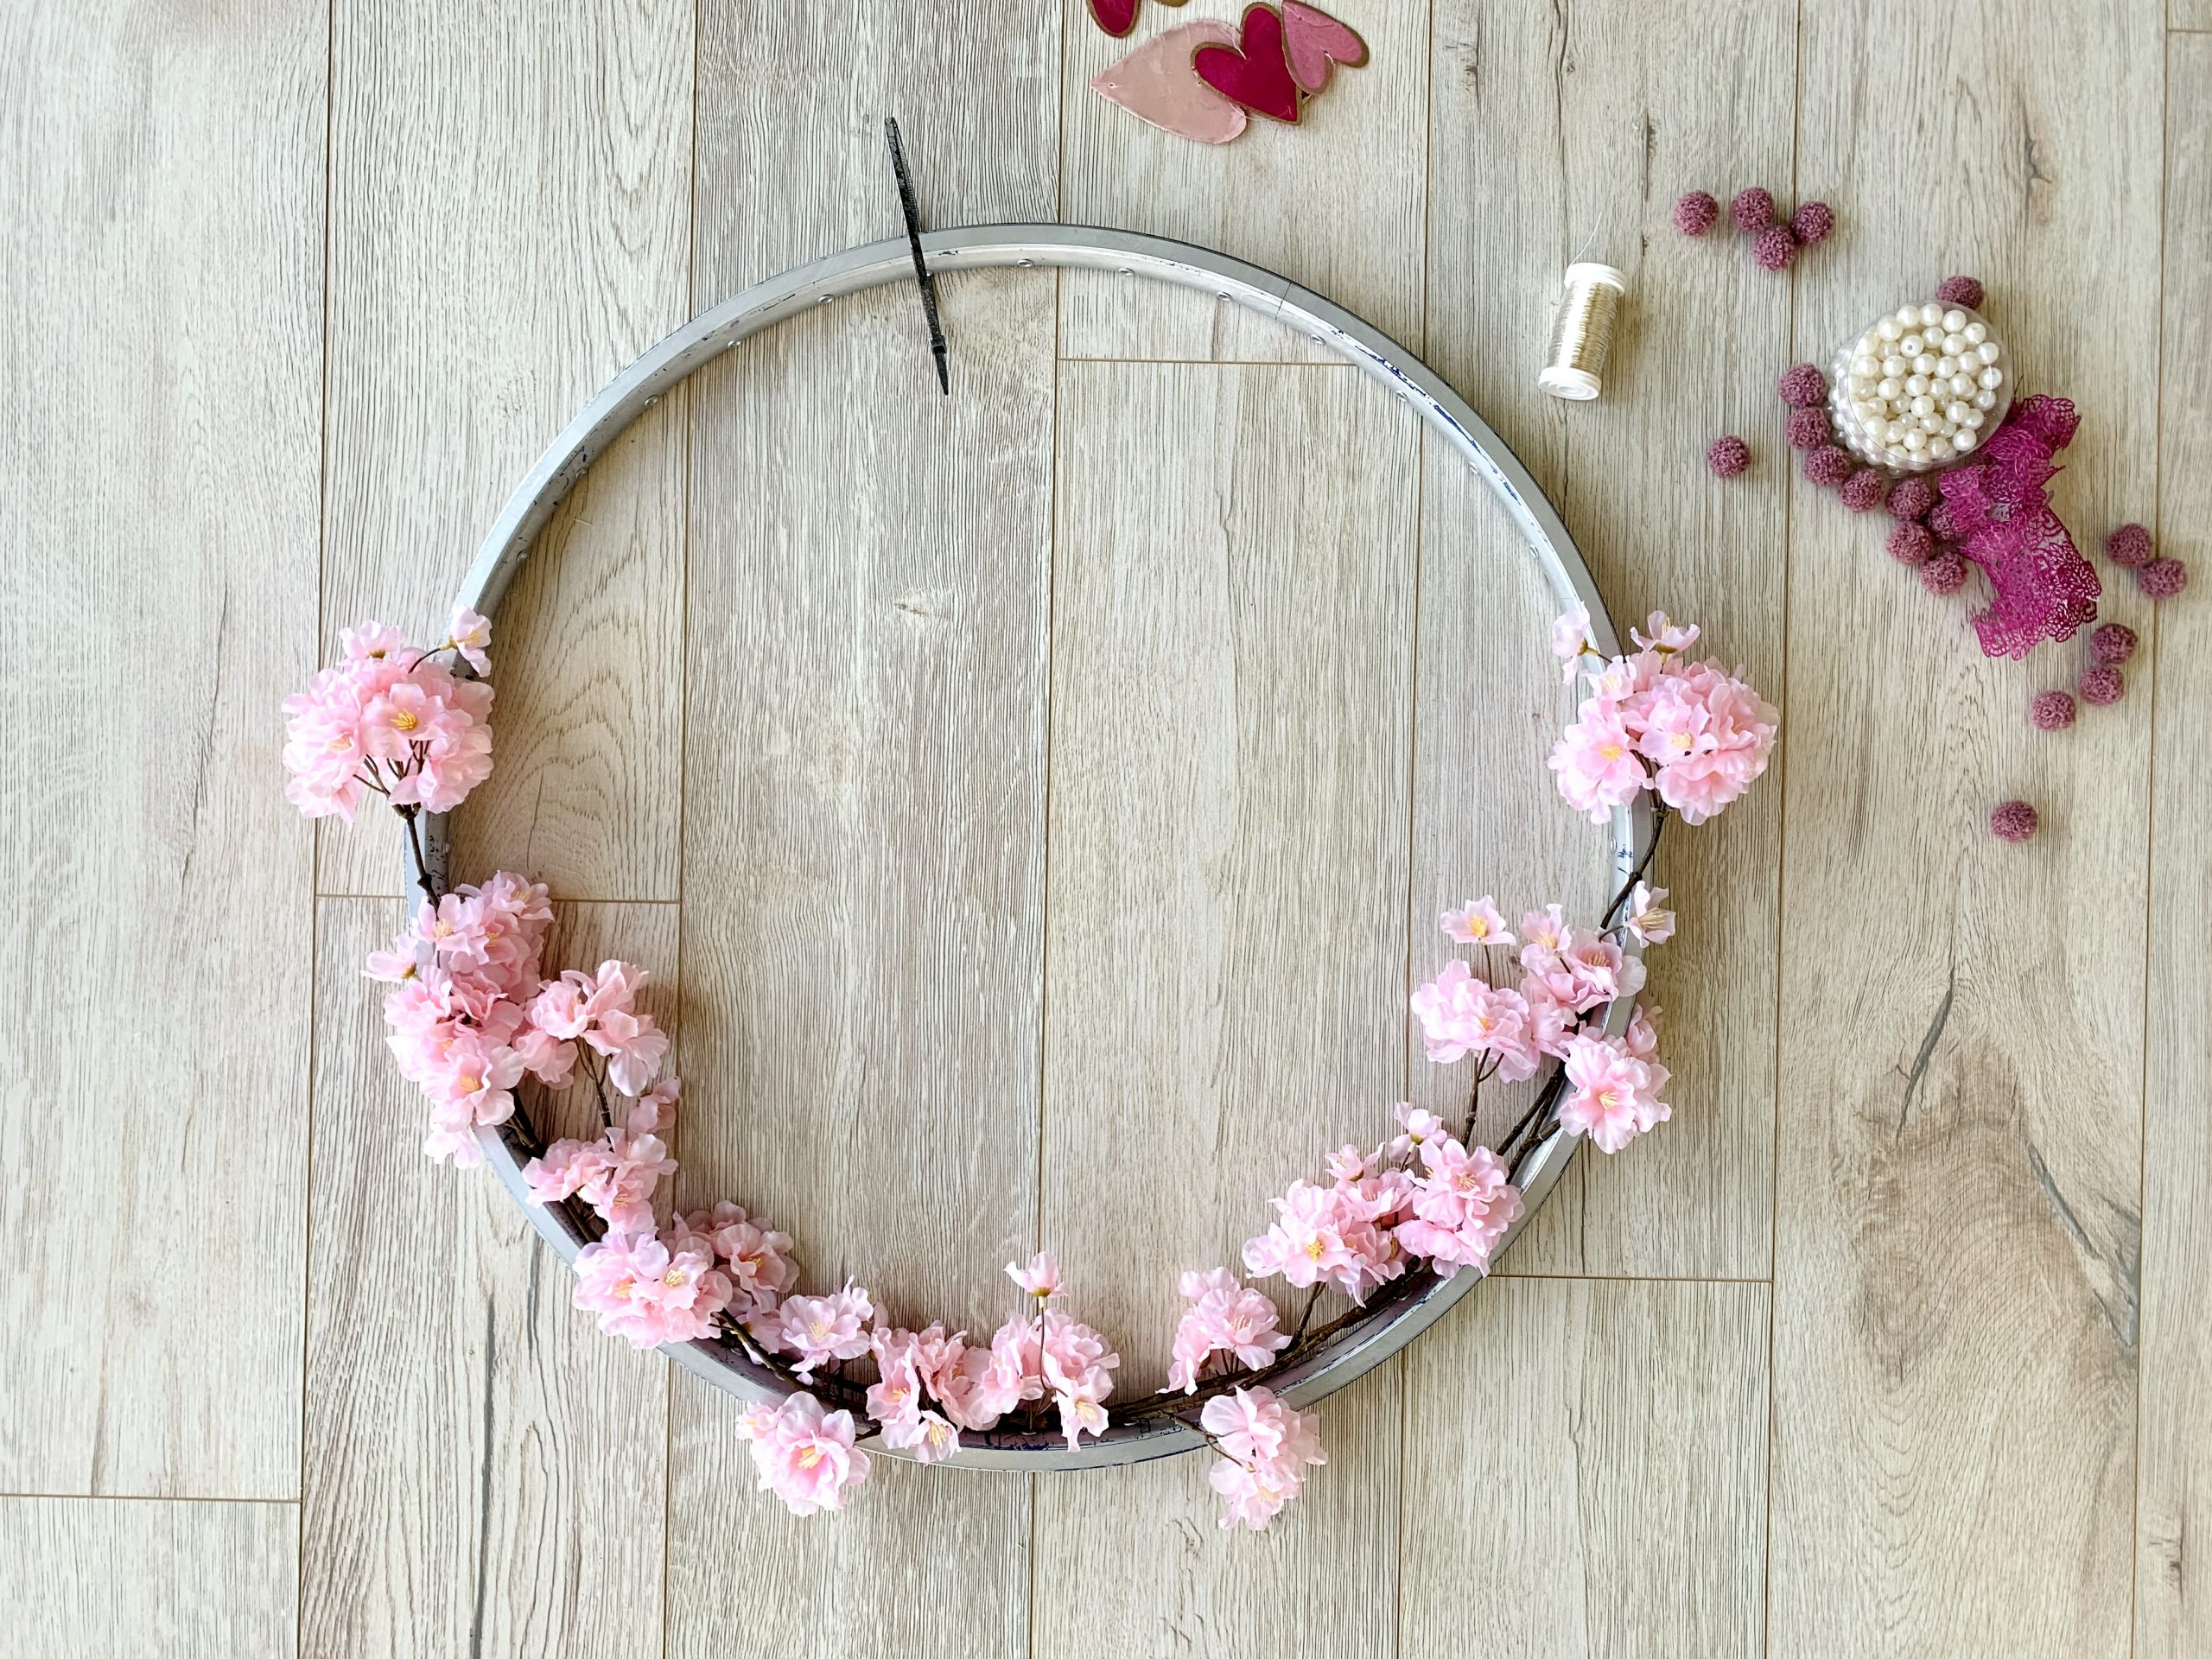 Kinderzimmerdeko Blütenkranz Blüten sind dran